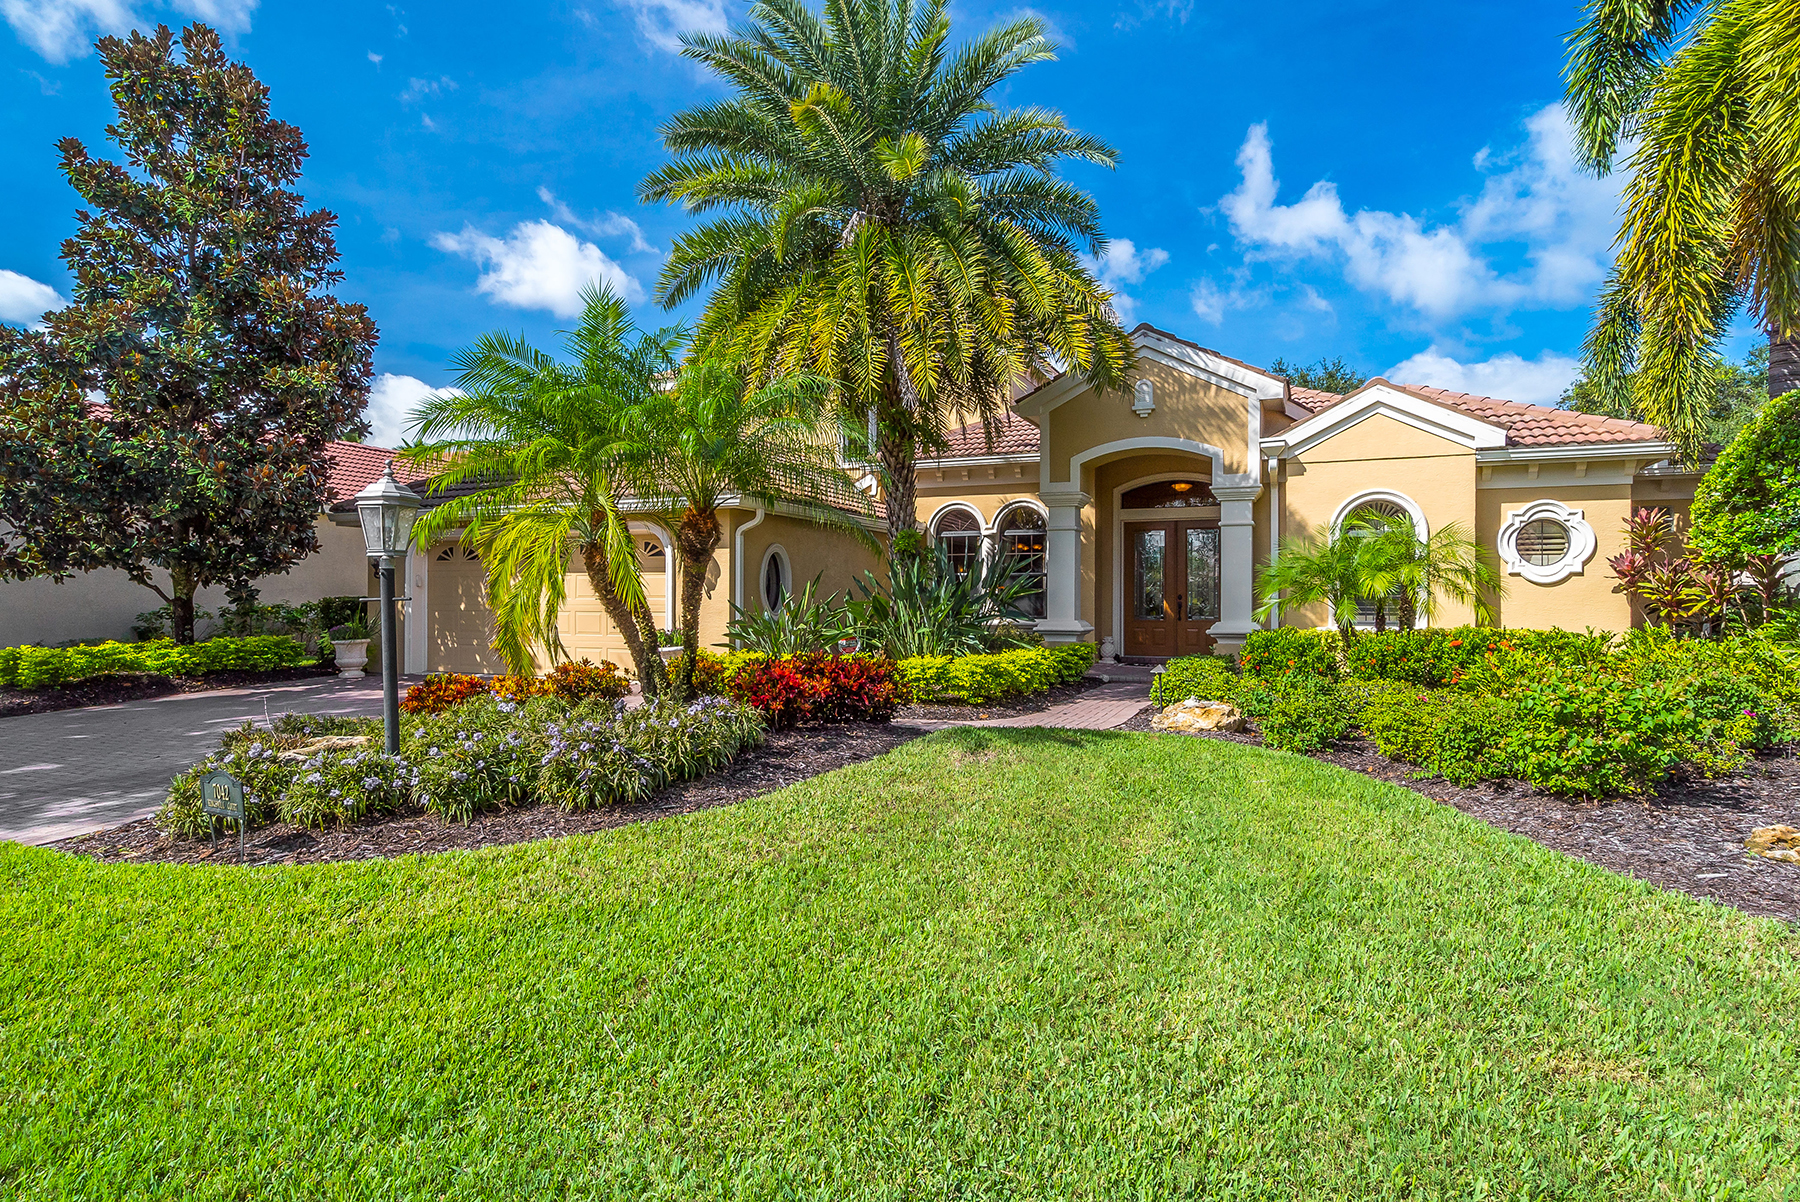 Casa para uma família para Venda às LAKEWOOD RANCH COUNTRY CLUB 7042 Kingsmill Ct Lakewood Ranch, Florida, 34202 Estados Unidos